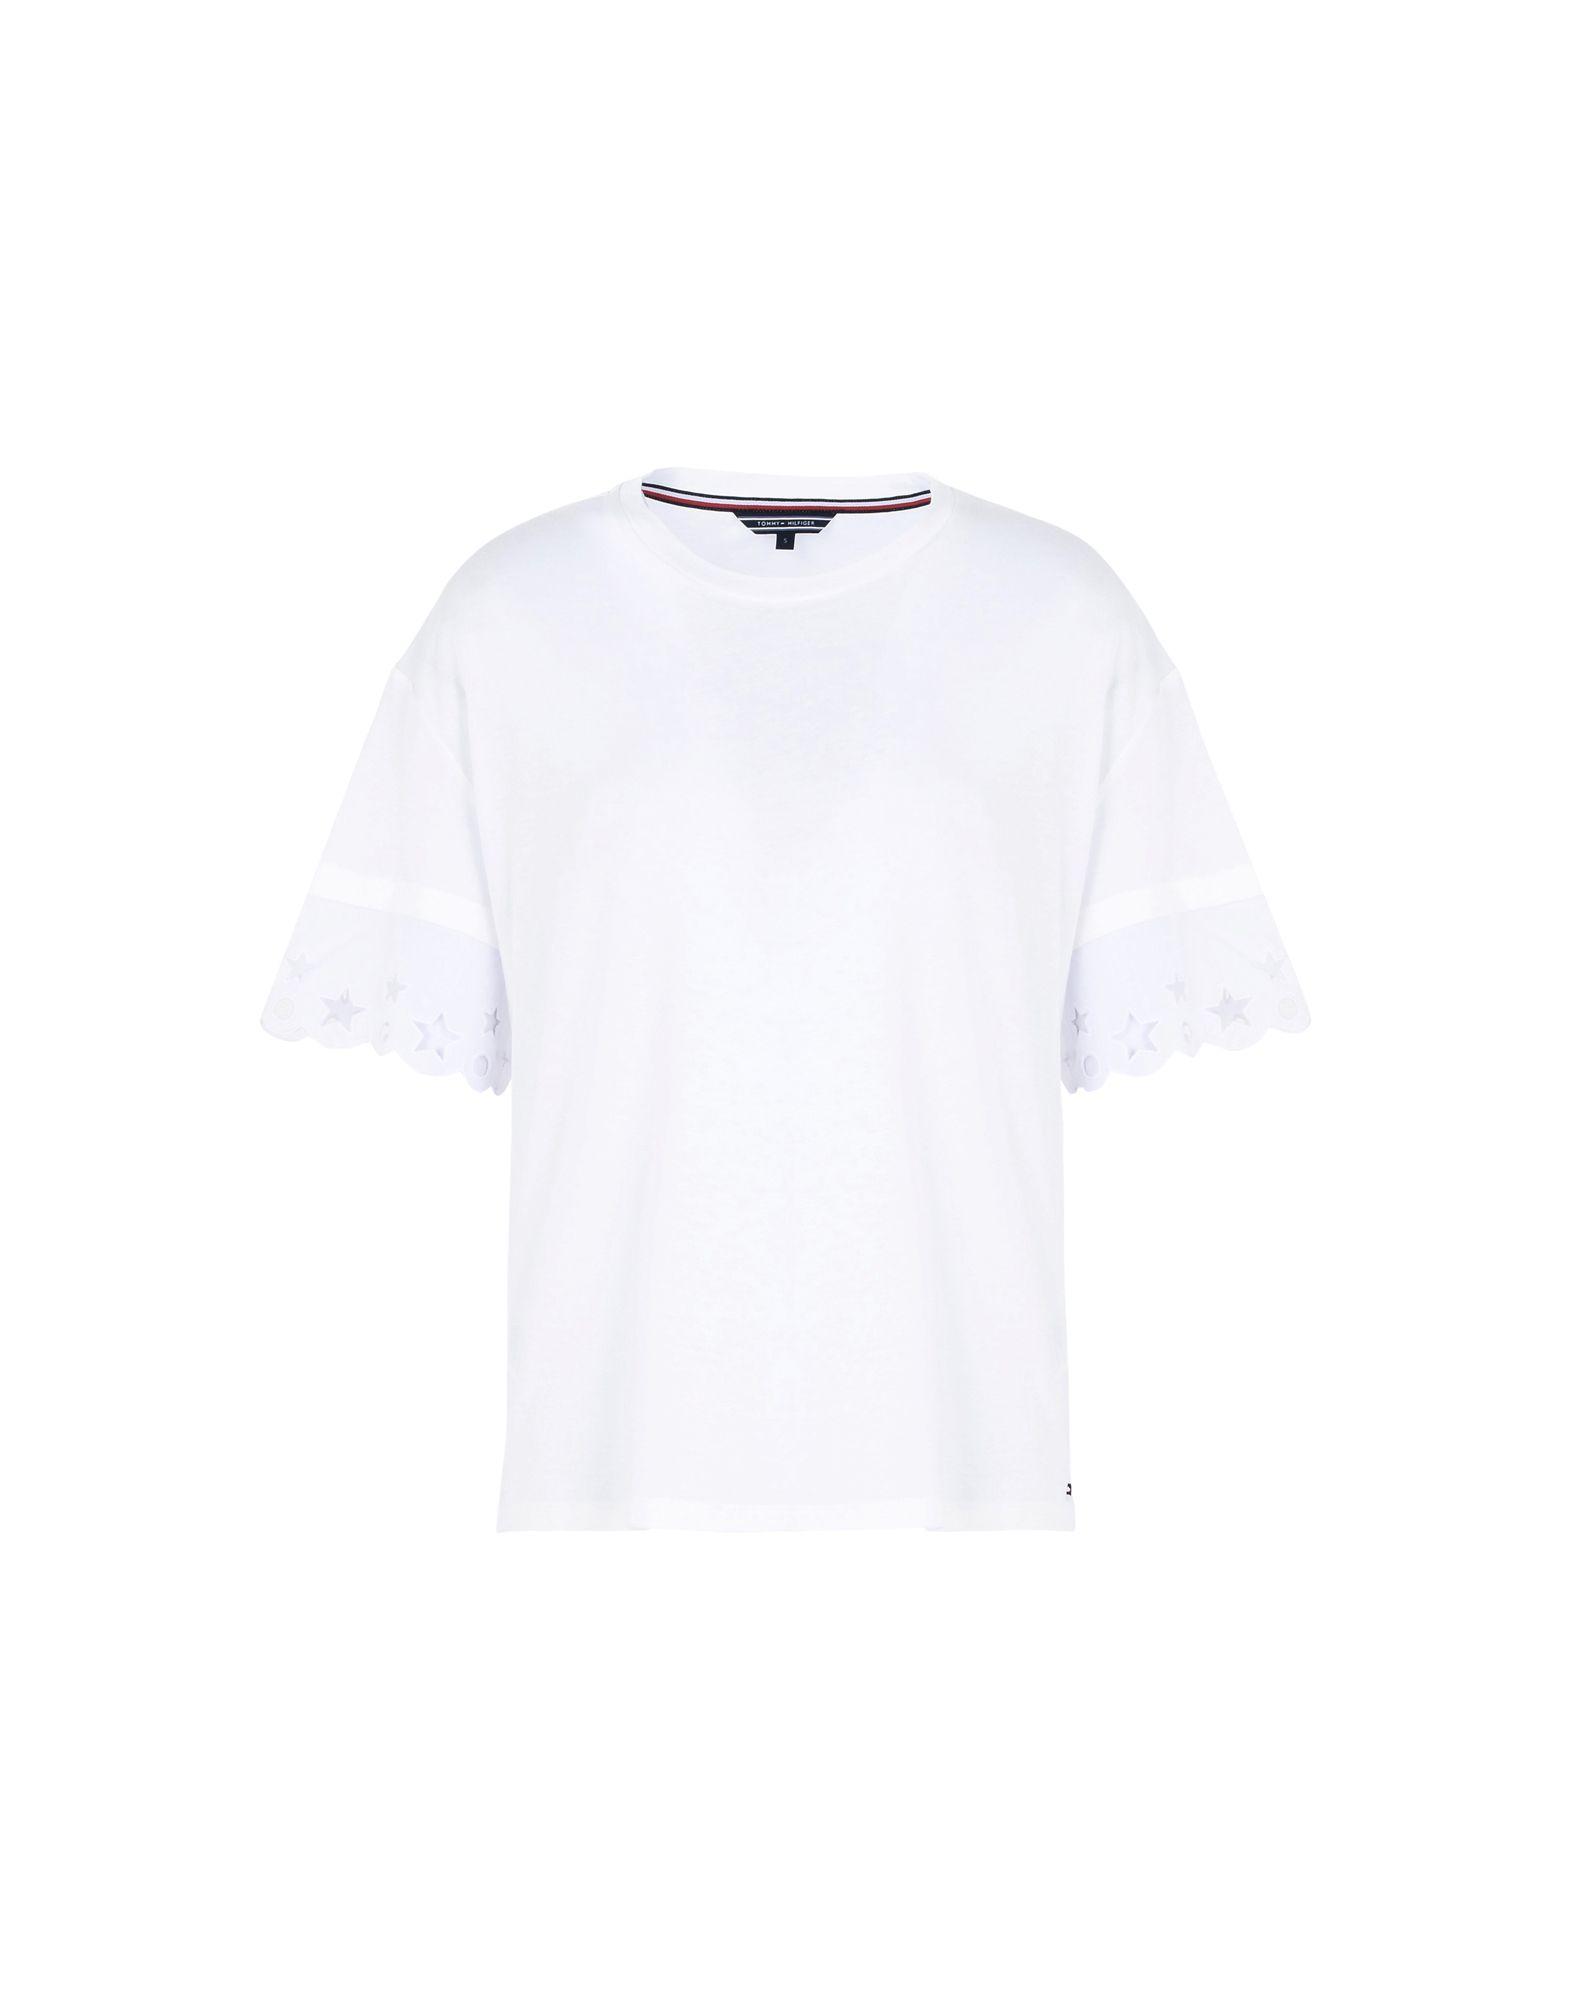 TOMMY HILFIGER Футболка футболка tommy hilfiger mw0mw05033 501 cloud htr